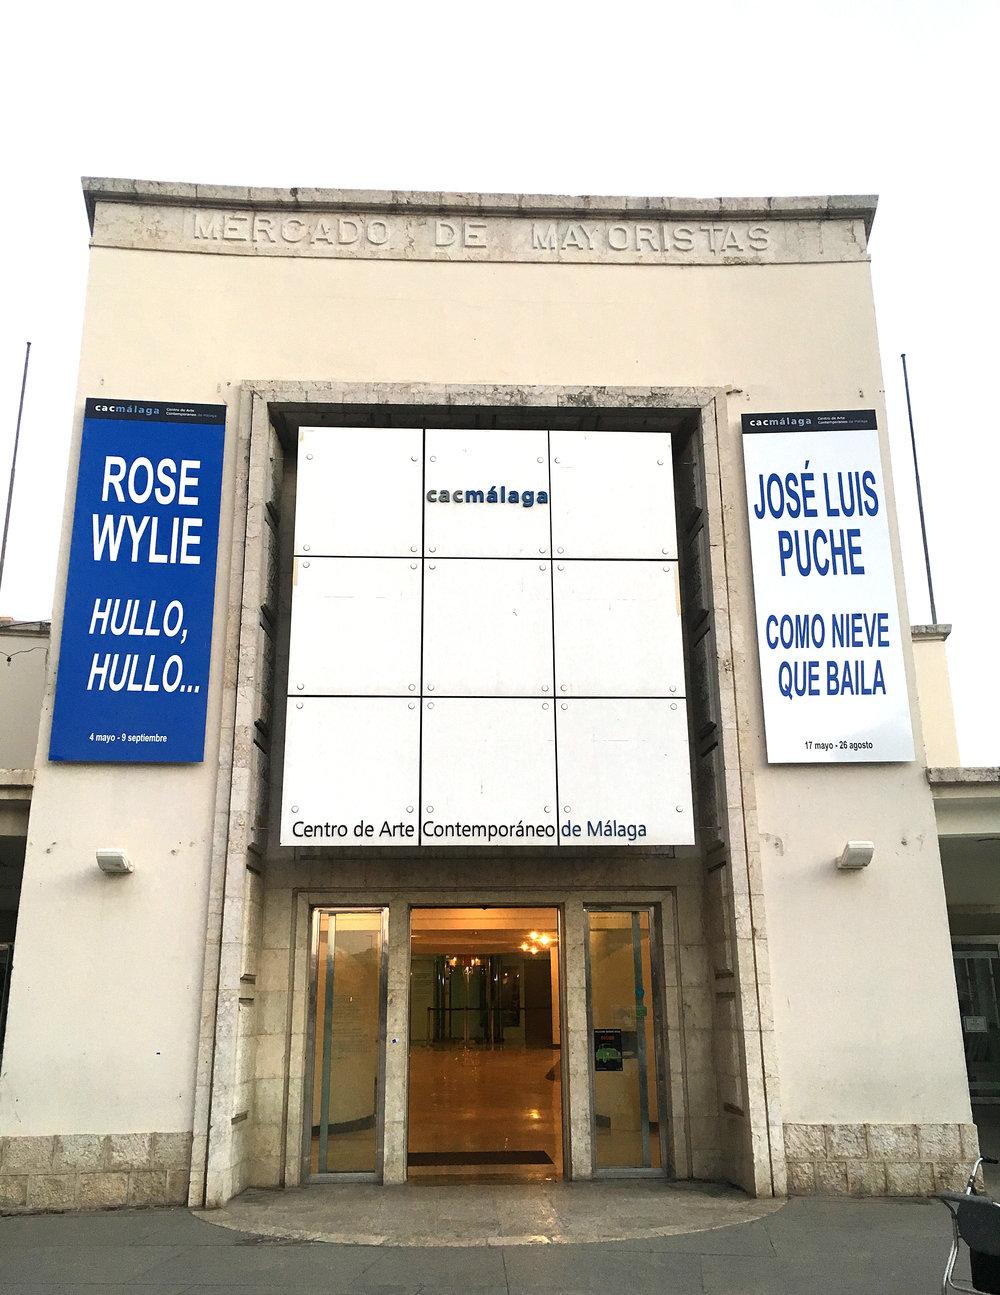 cac-malaga-jose-luis-puche-eldevenir-arte-online-gallery-galeria-malaga-contemporaneo.jpg